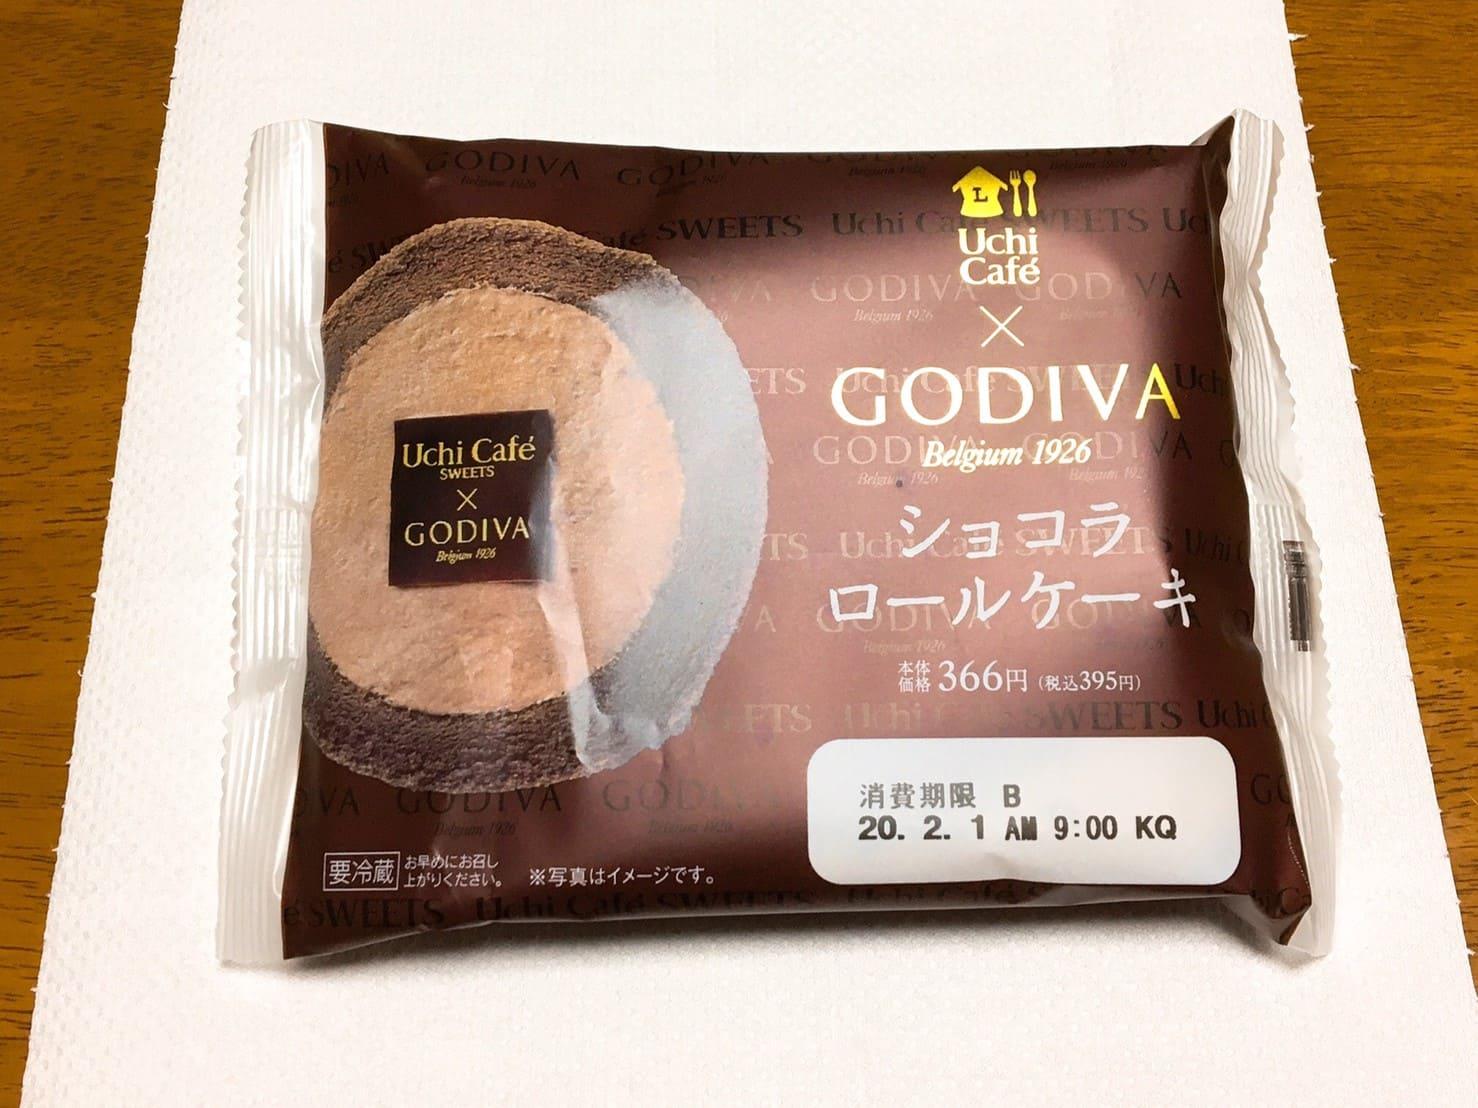 Uchi Café × GODIVA ショコラロールケーキ